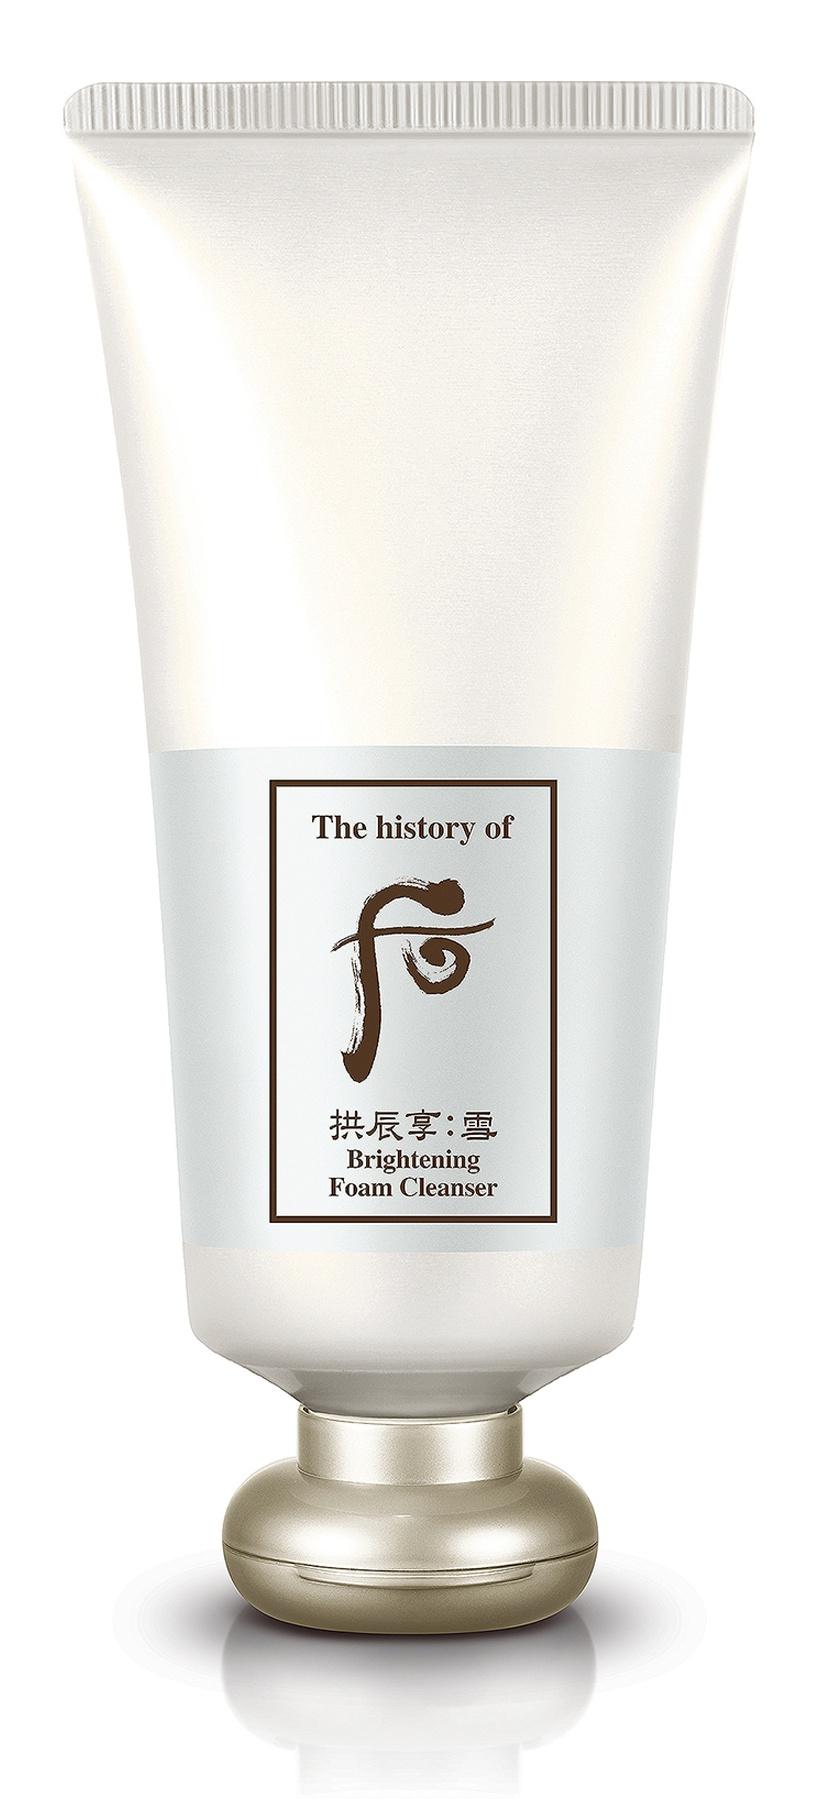 The History of Whoo Gongjinhyang: Seol Brightening Foam Cleanser